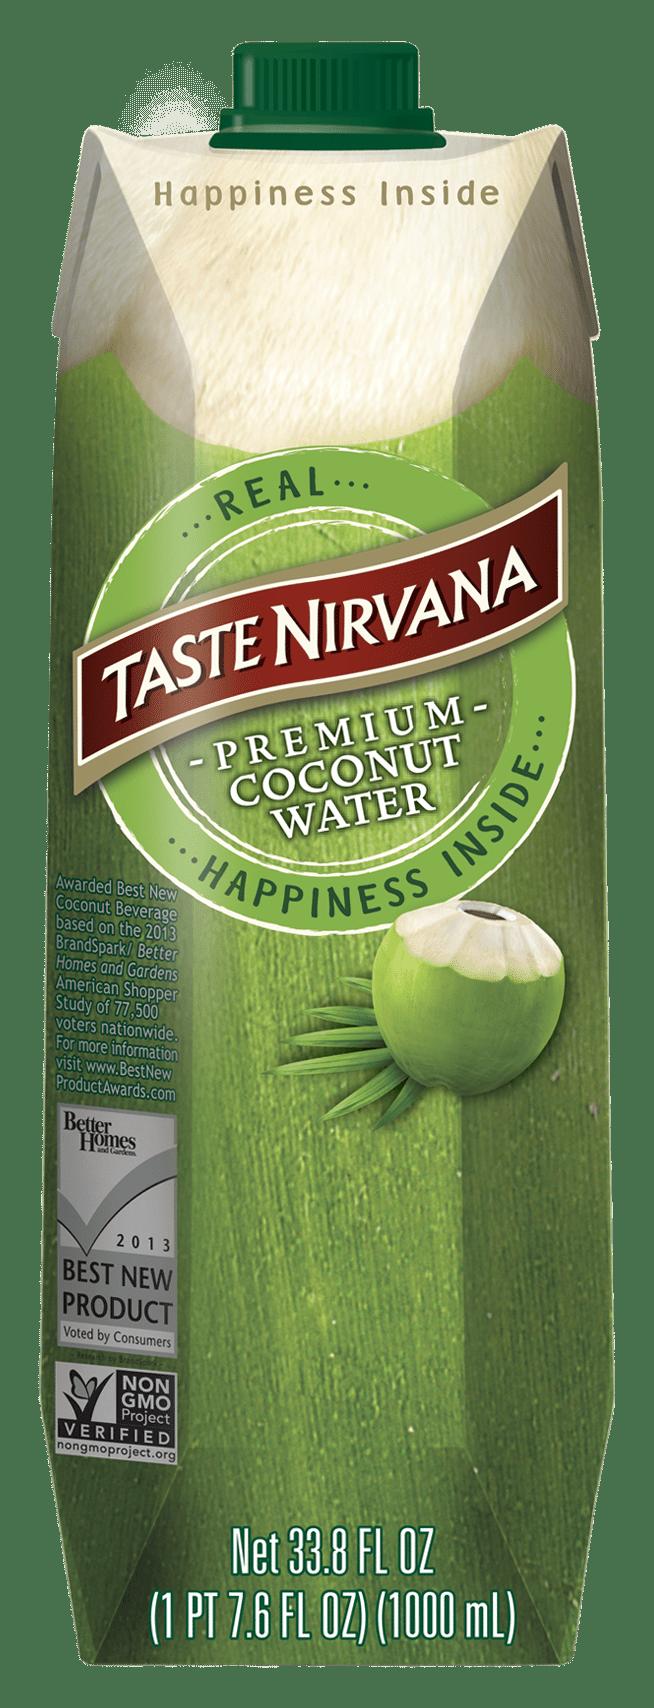 Tetra Pak Real Coconut Water